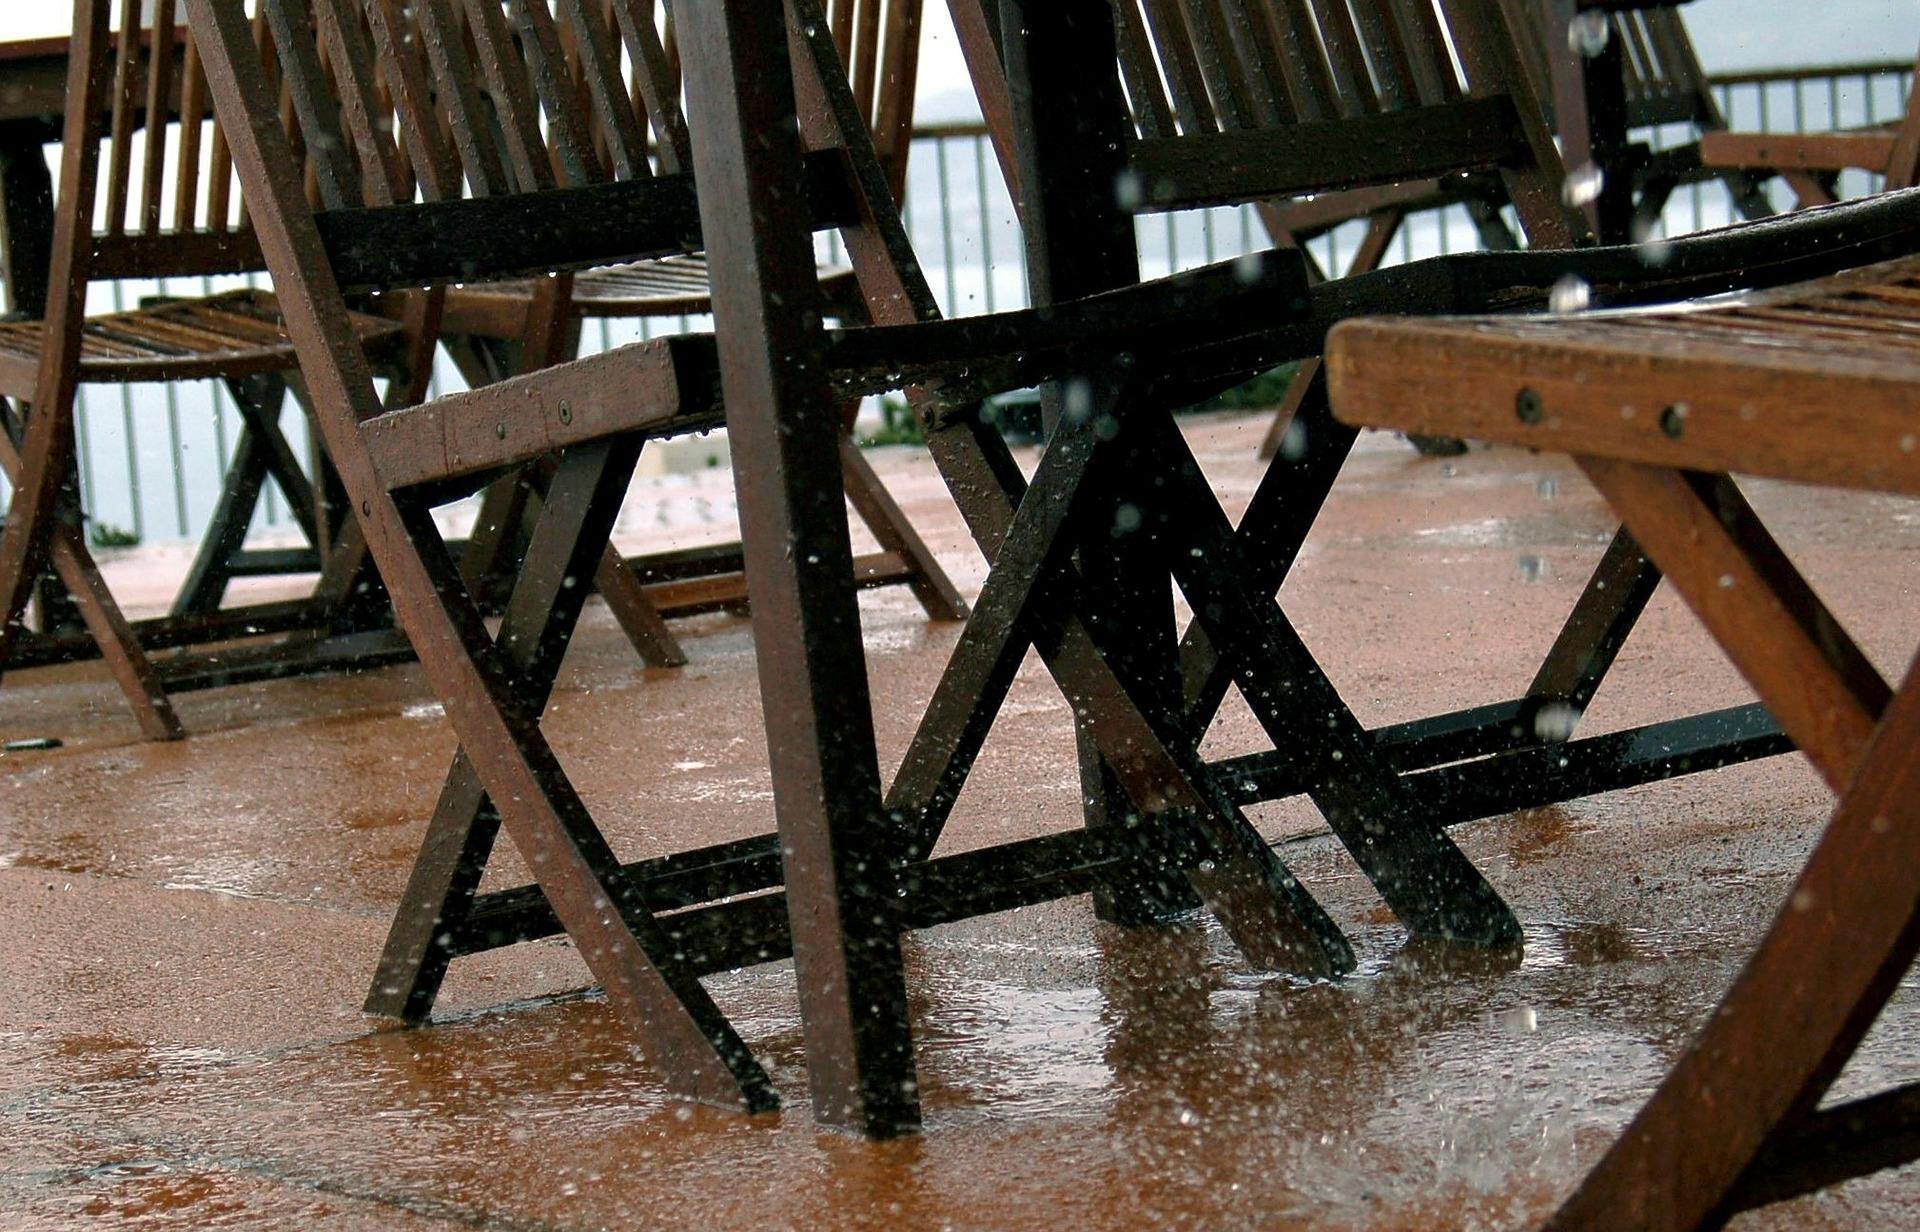 rain-123898_1920.jpg